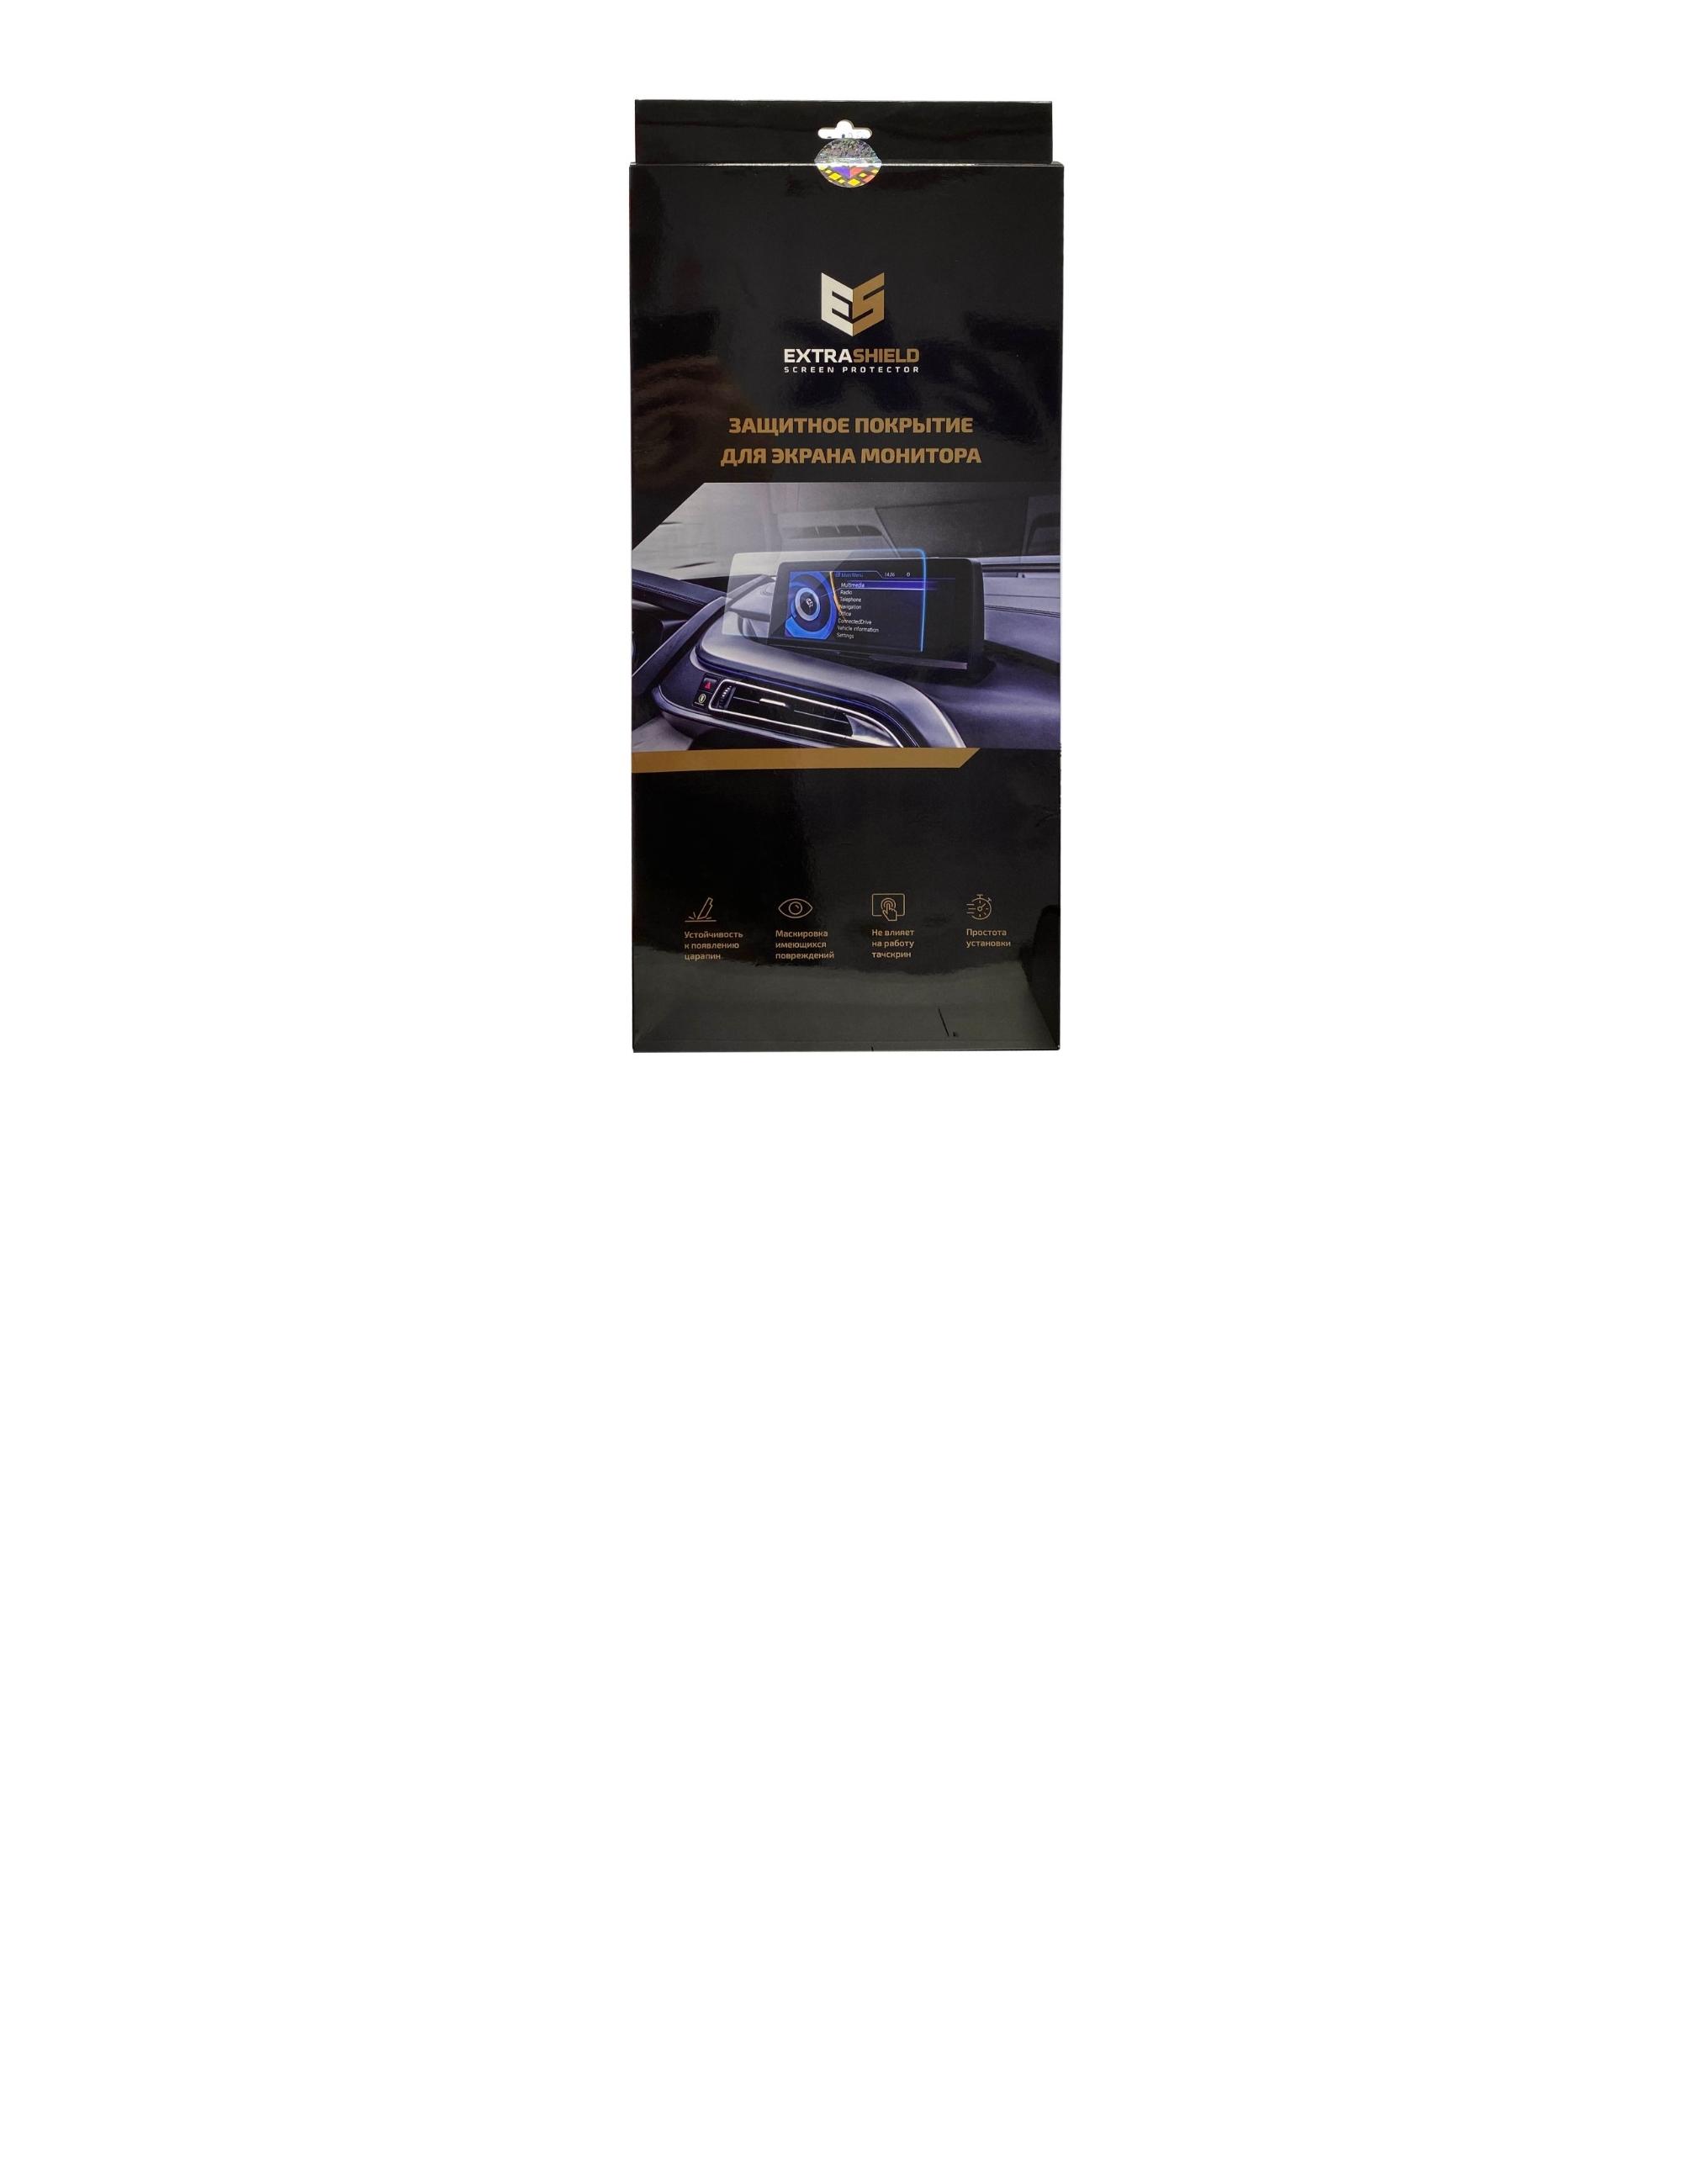 Audi A5 (F5) 2016 - н.в. мультимедиа MMI 8.3 Защитное стекло Матовая